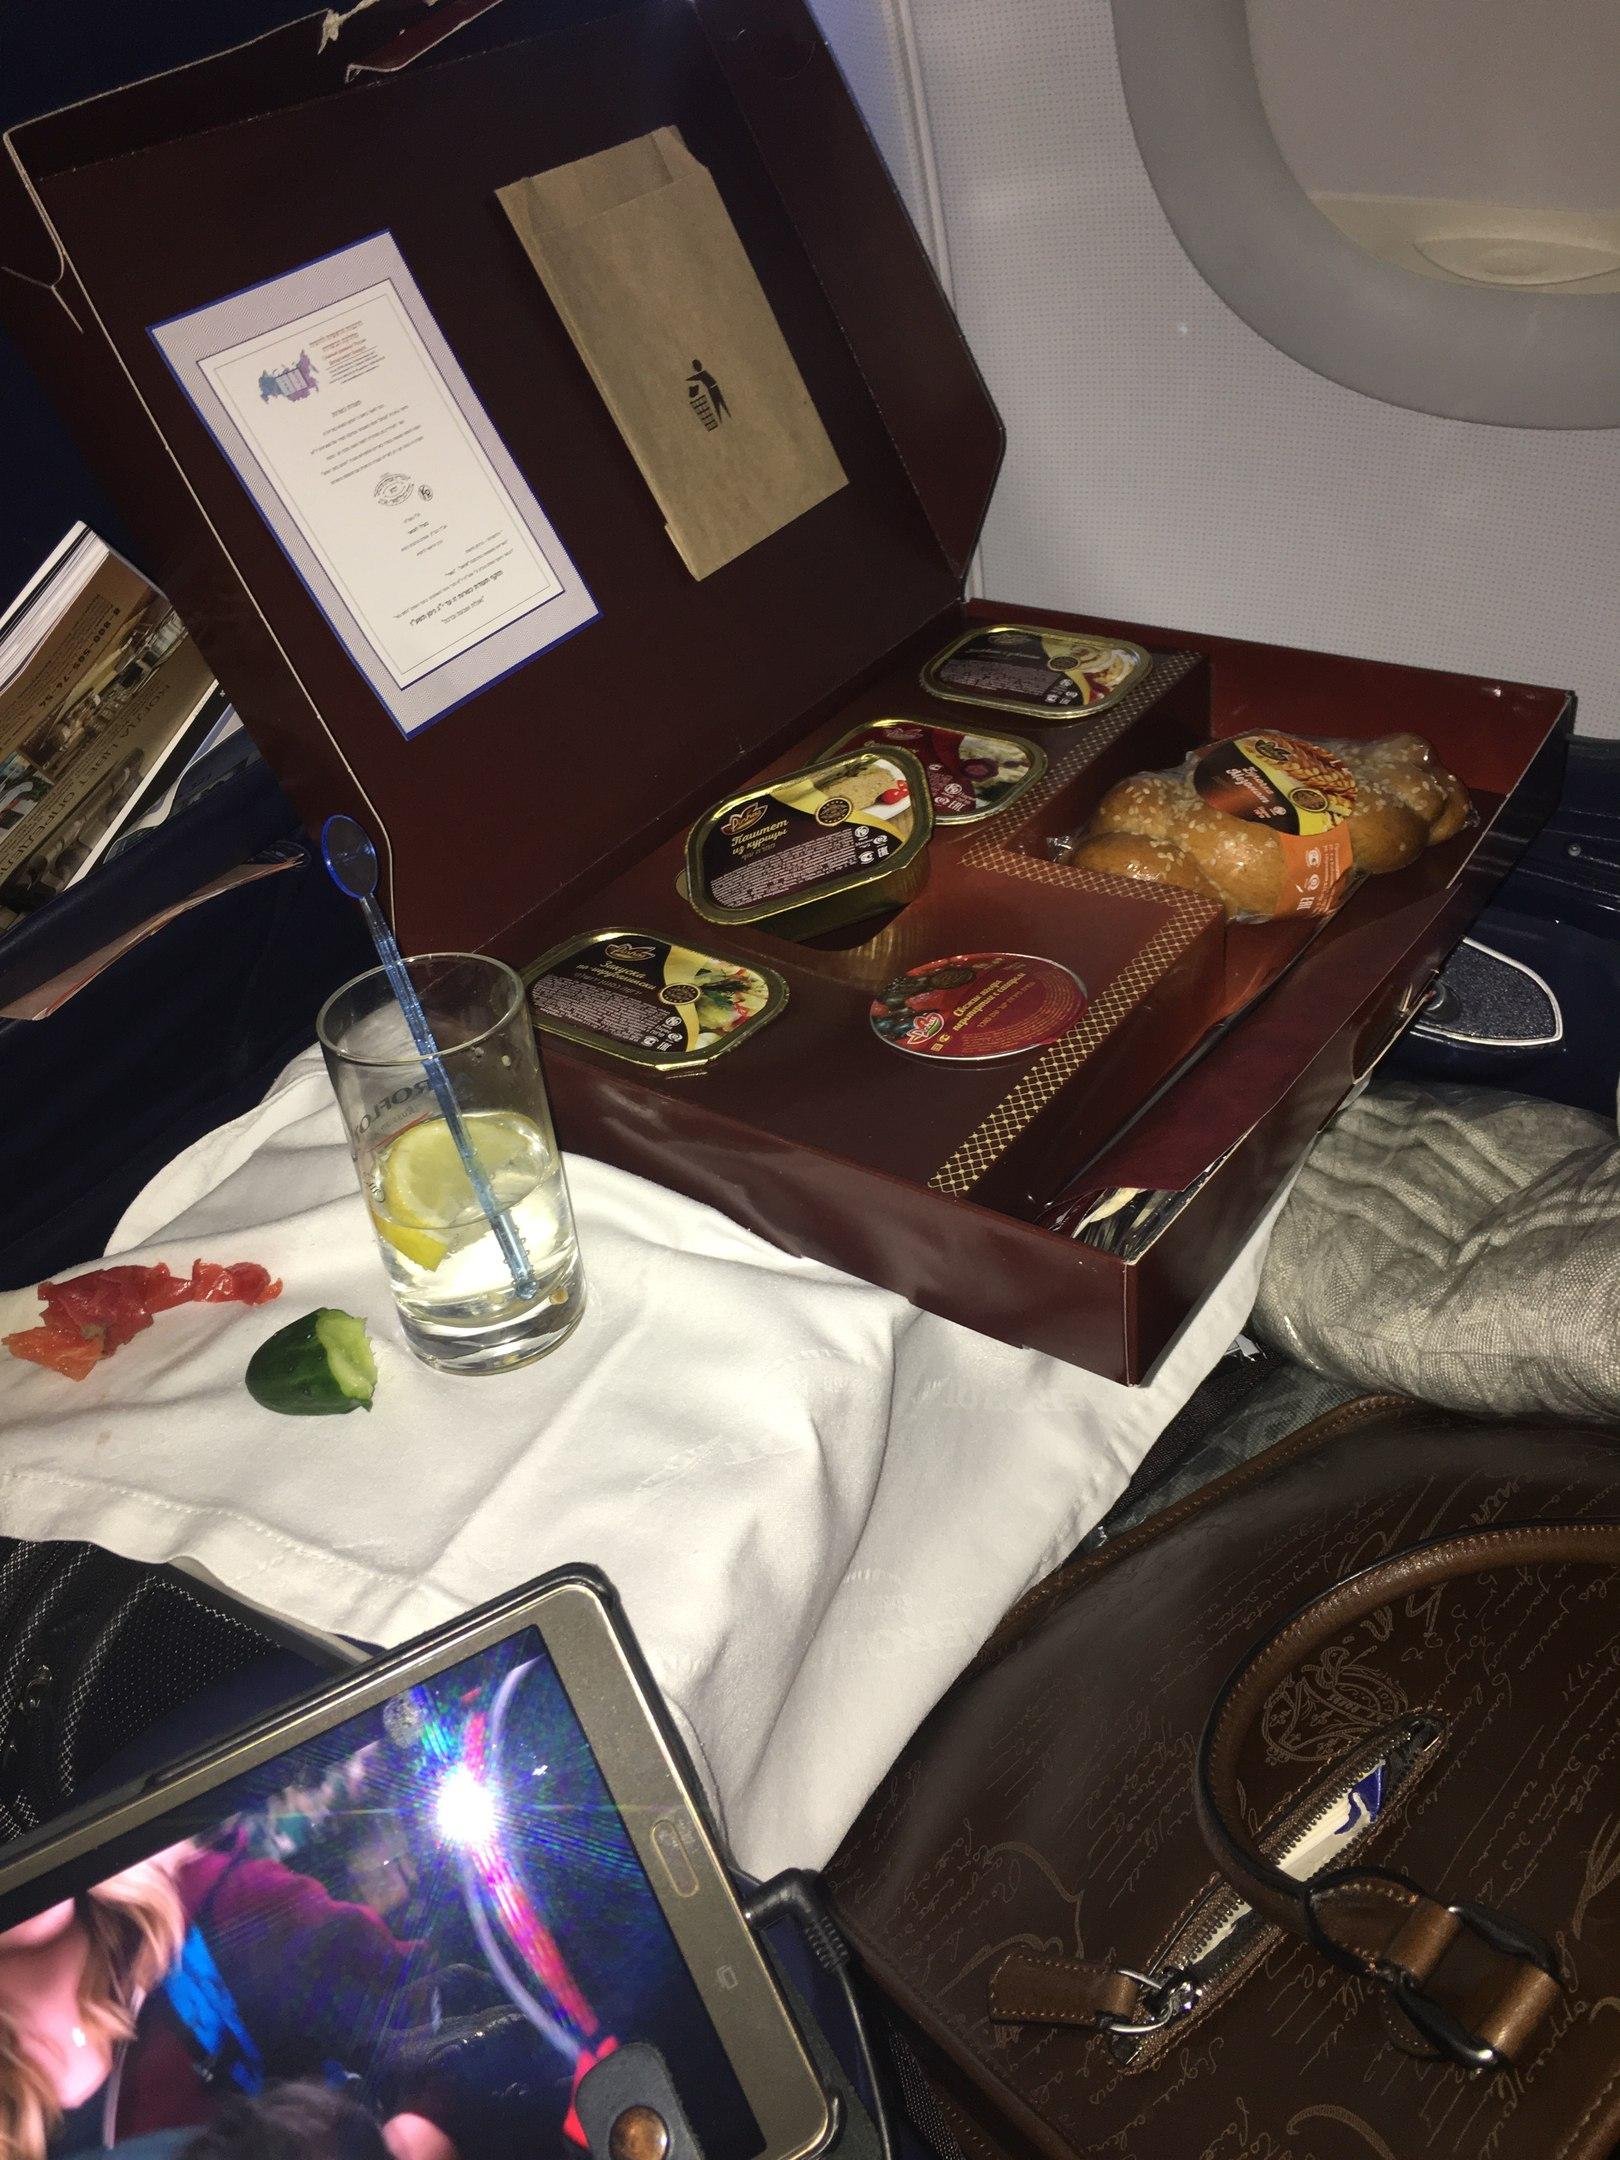 eda_dlia_evreev_na_aeroflote